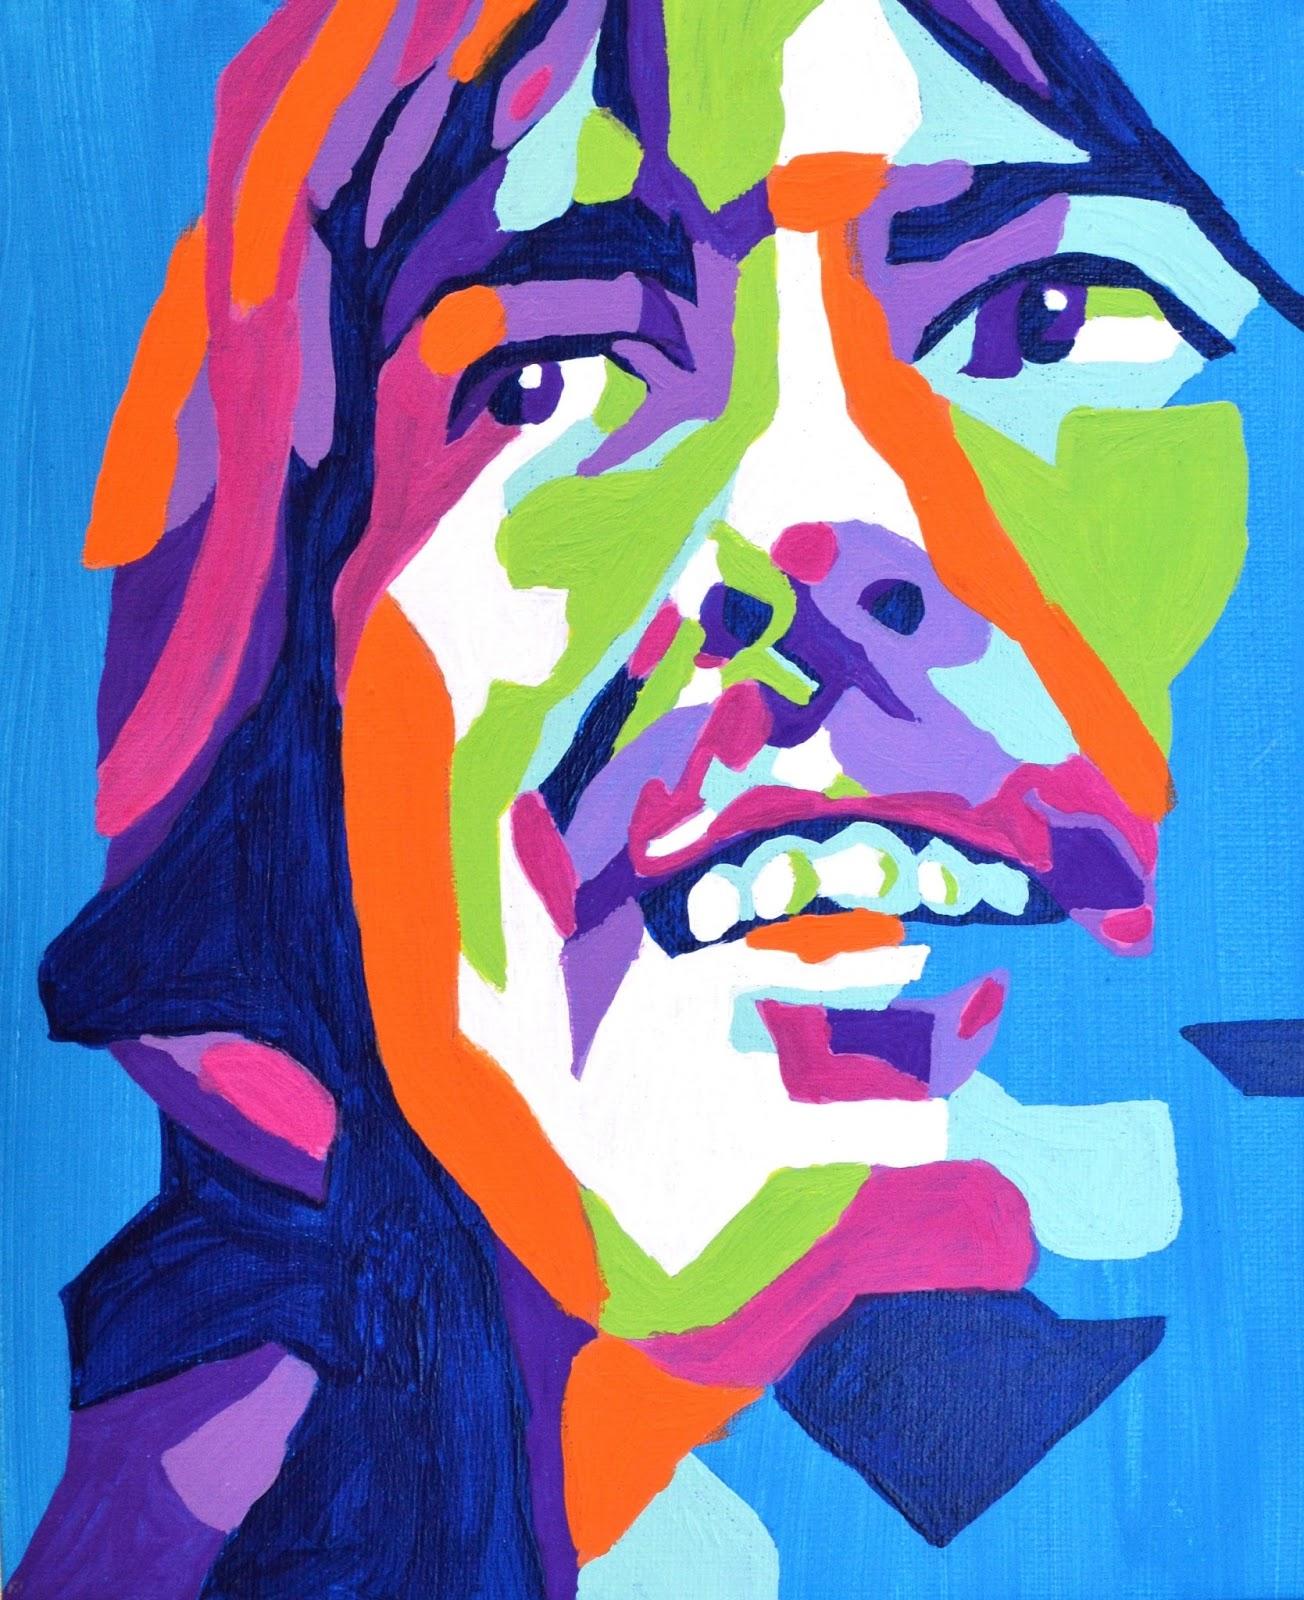 advanced art geometric beatles portrait paintings lessons from